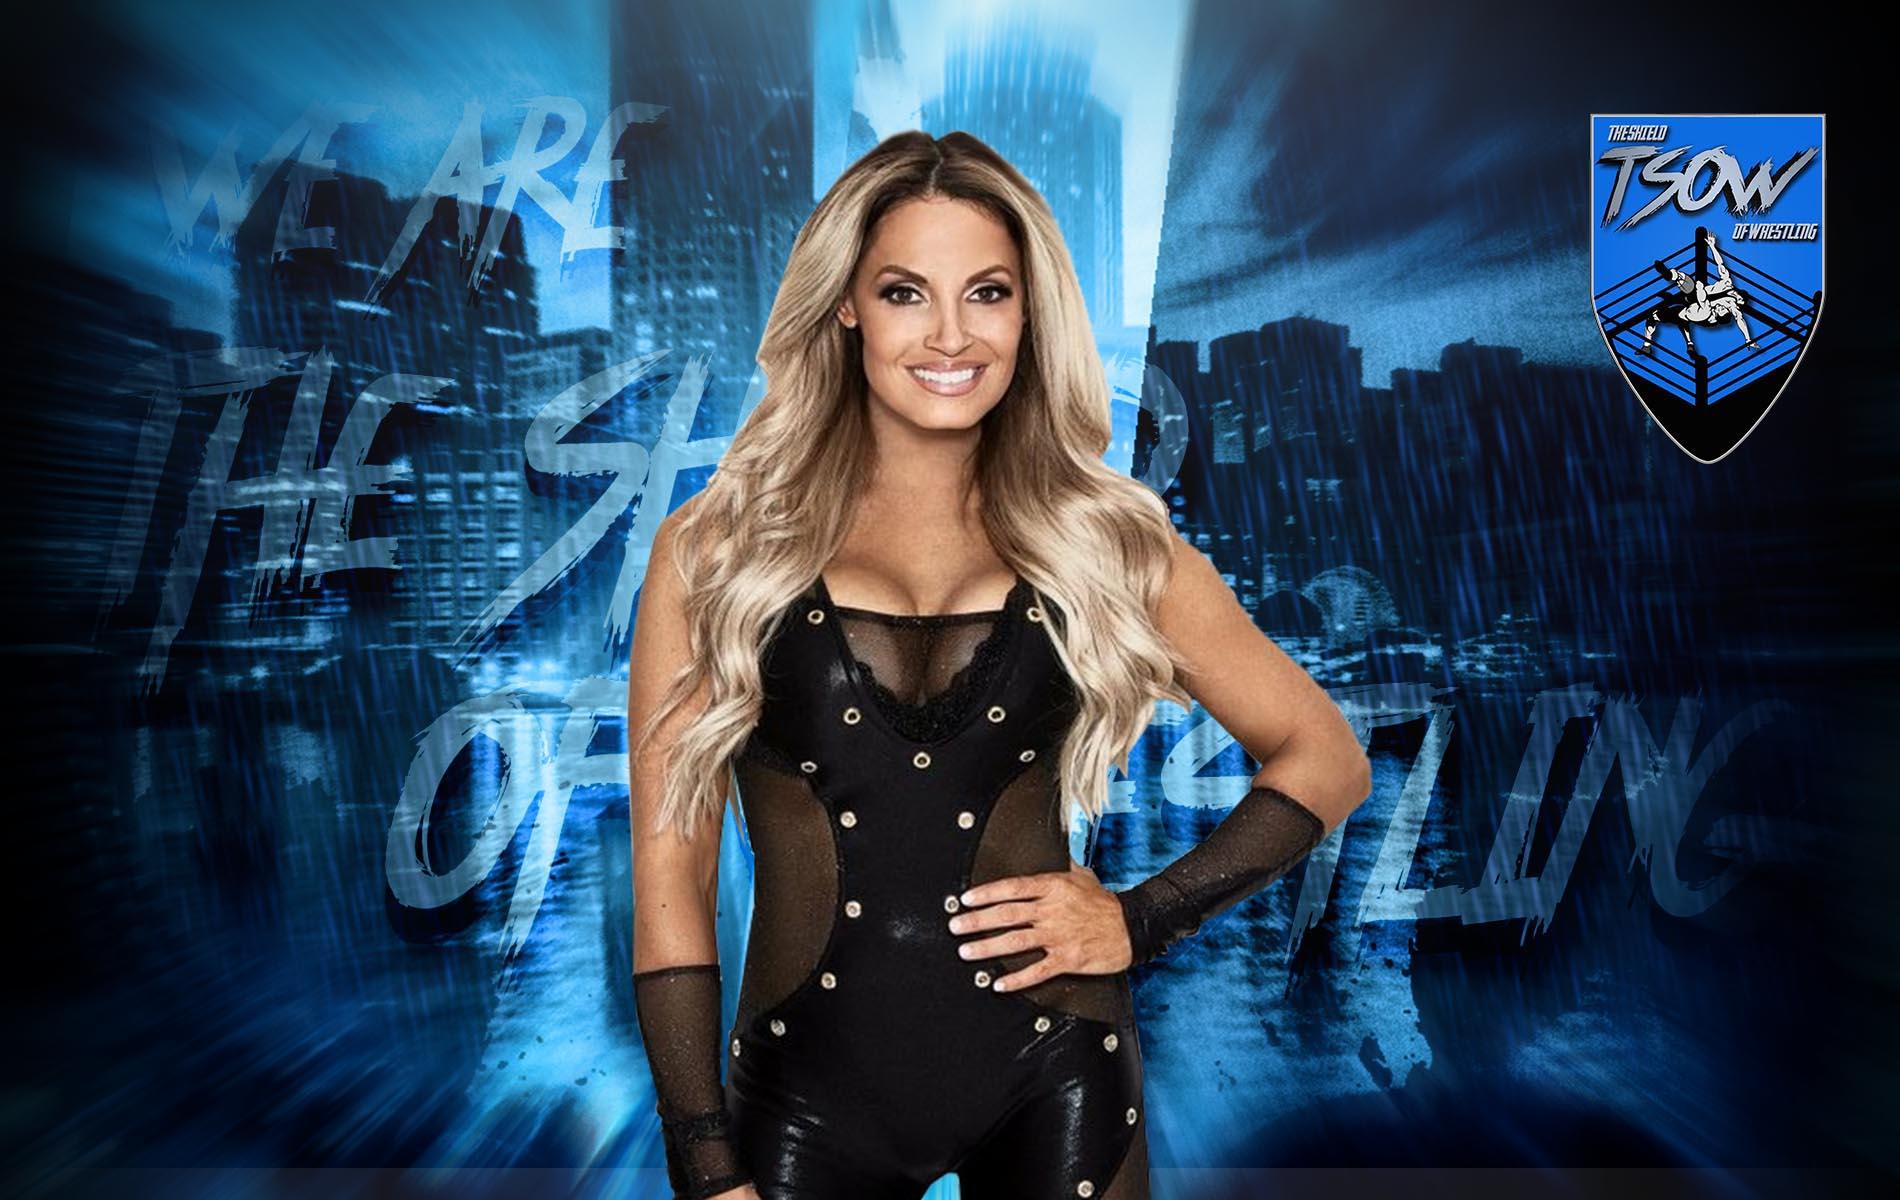 Trish Stratus sarà alla Royal Rumble? L'indizio di Natalya